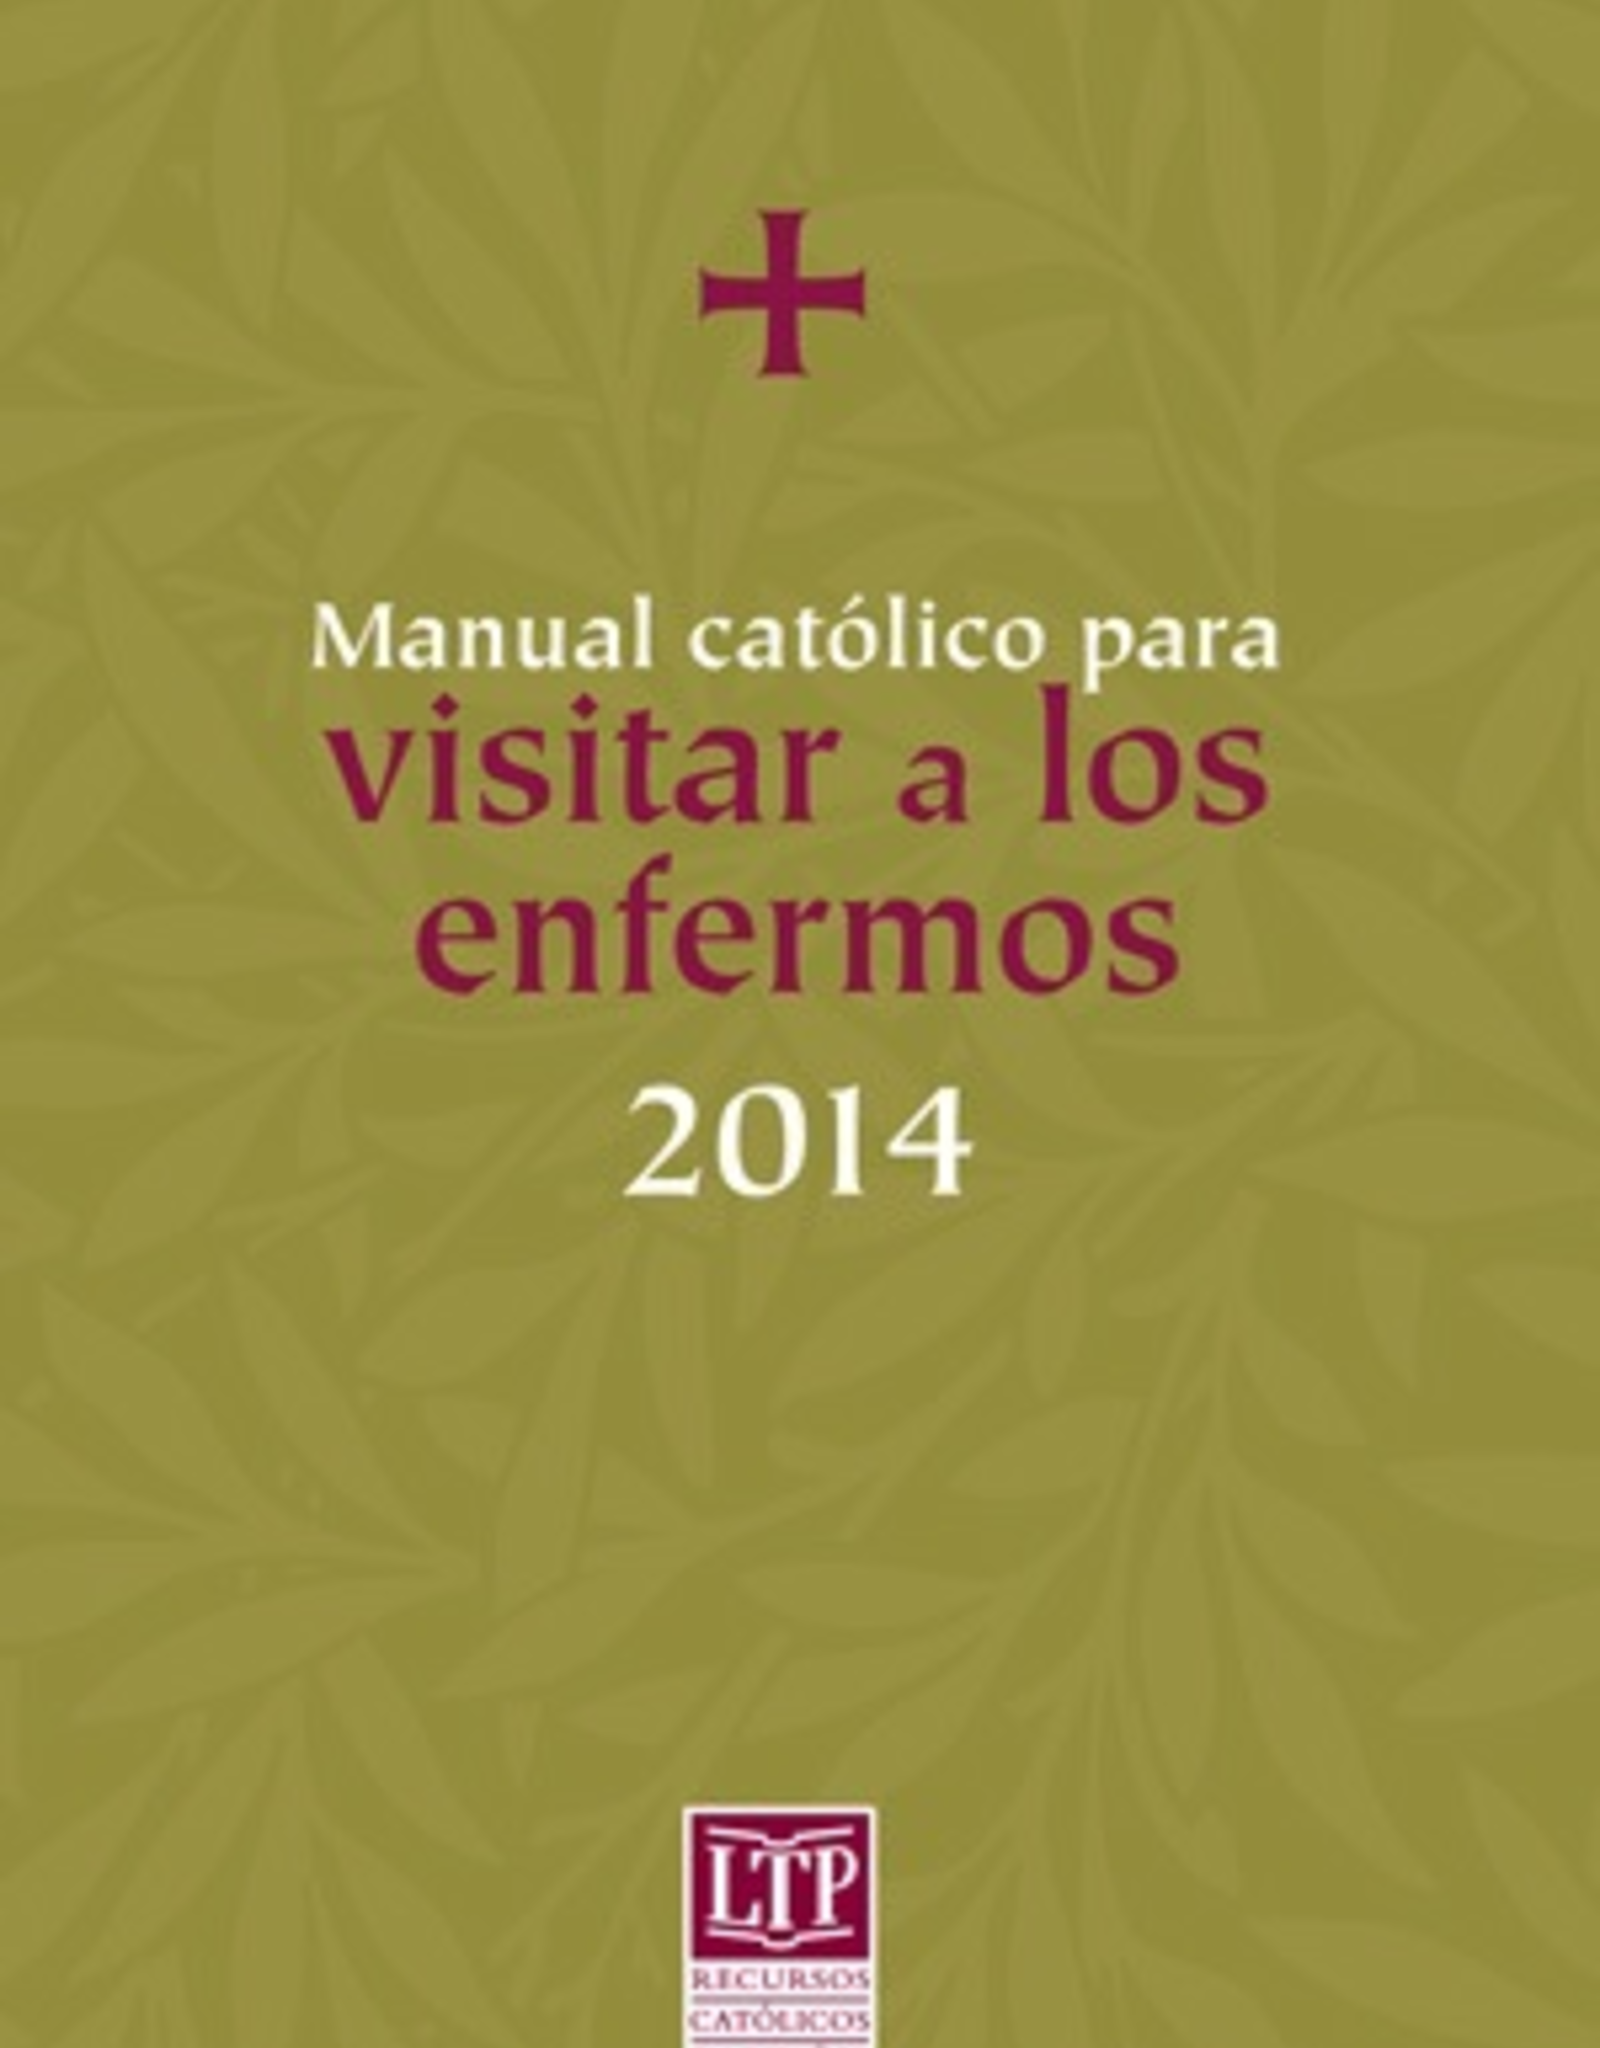 Liturgical Training Press Manual catÌ_lico para visitar a los enfermos 2014